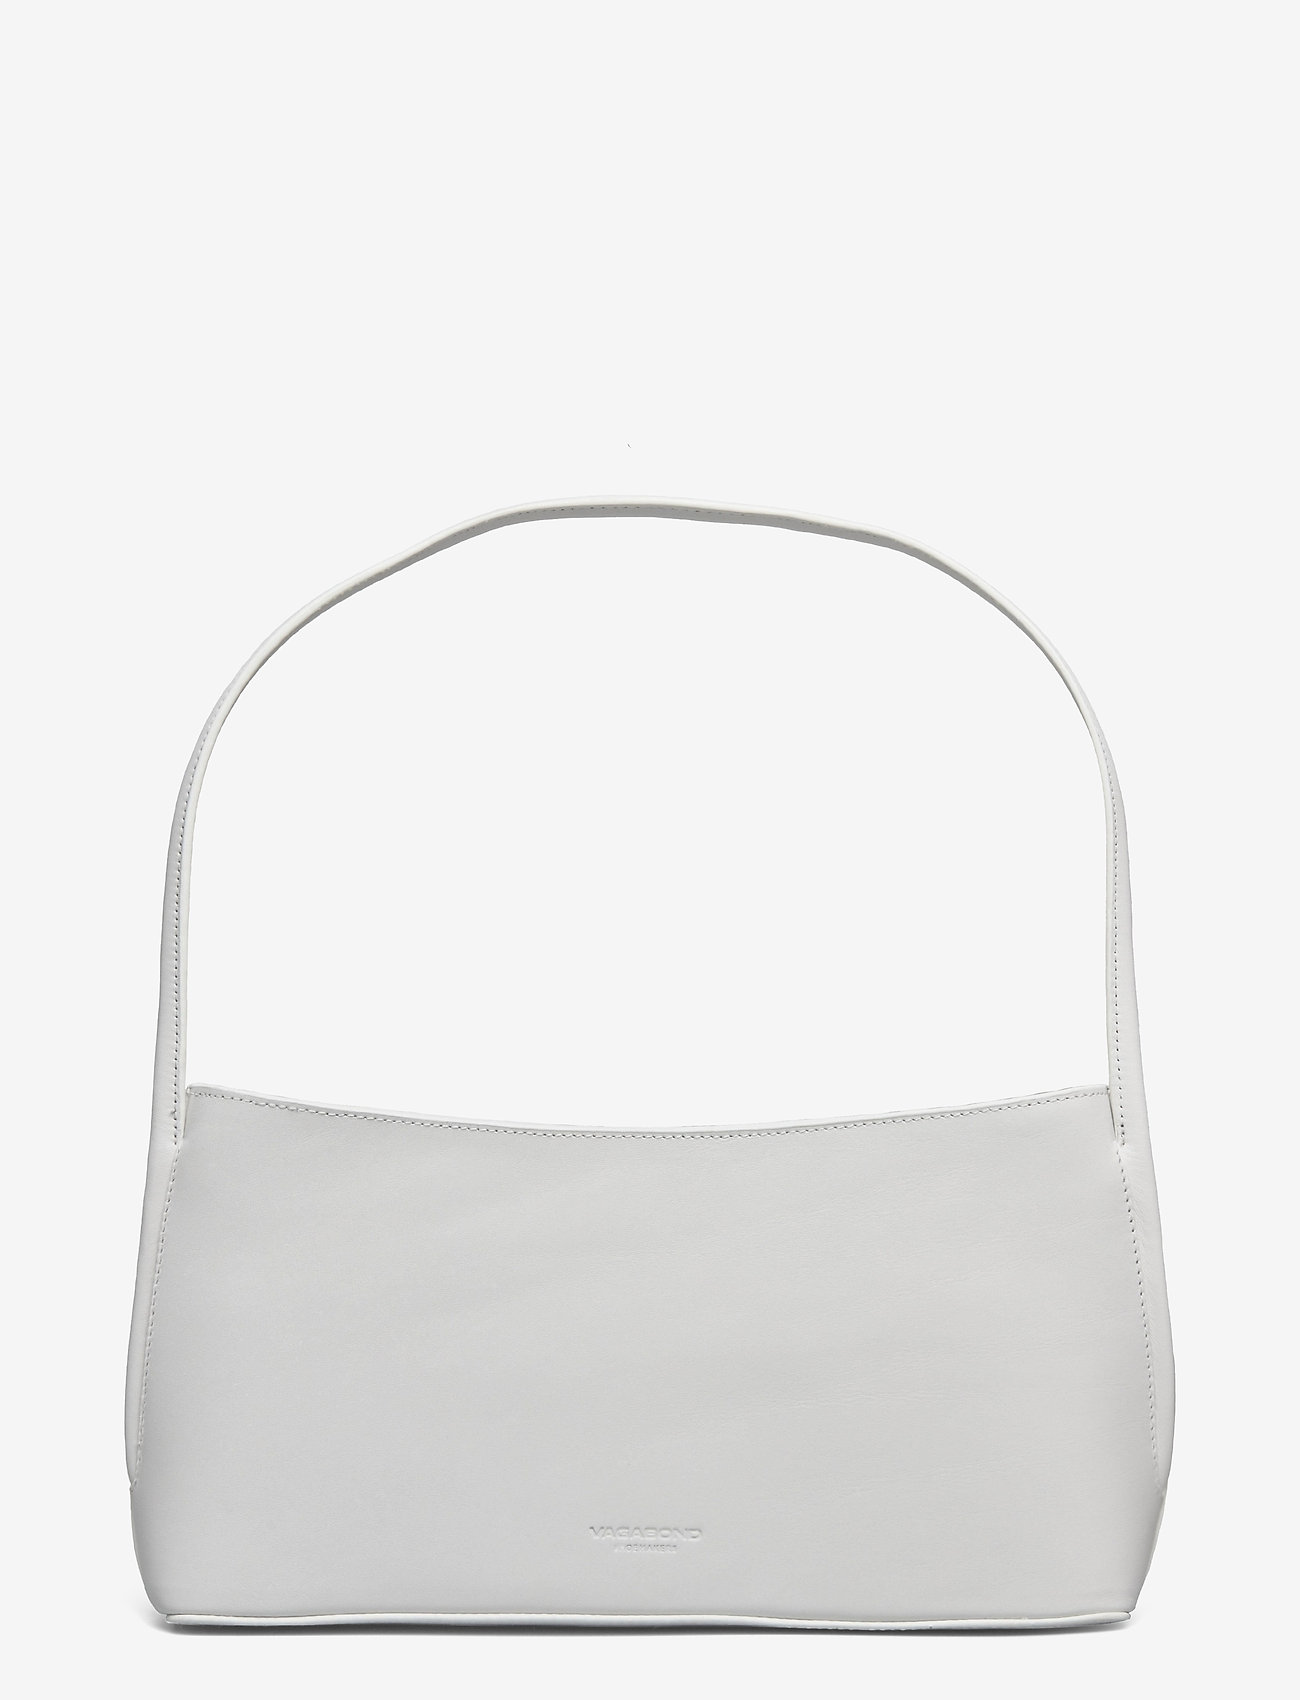 VAGABOND - VERONA - handtassen - white - 1